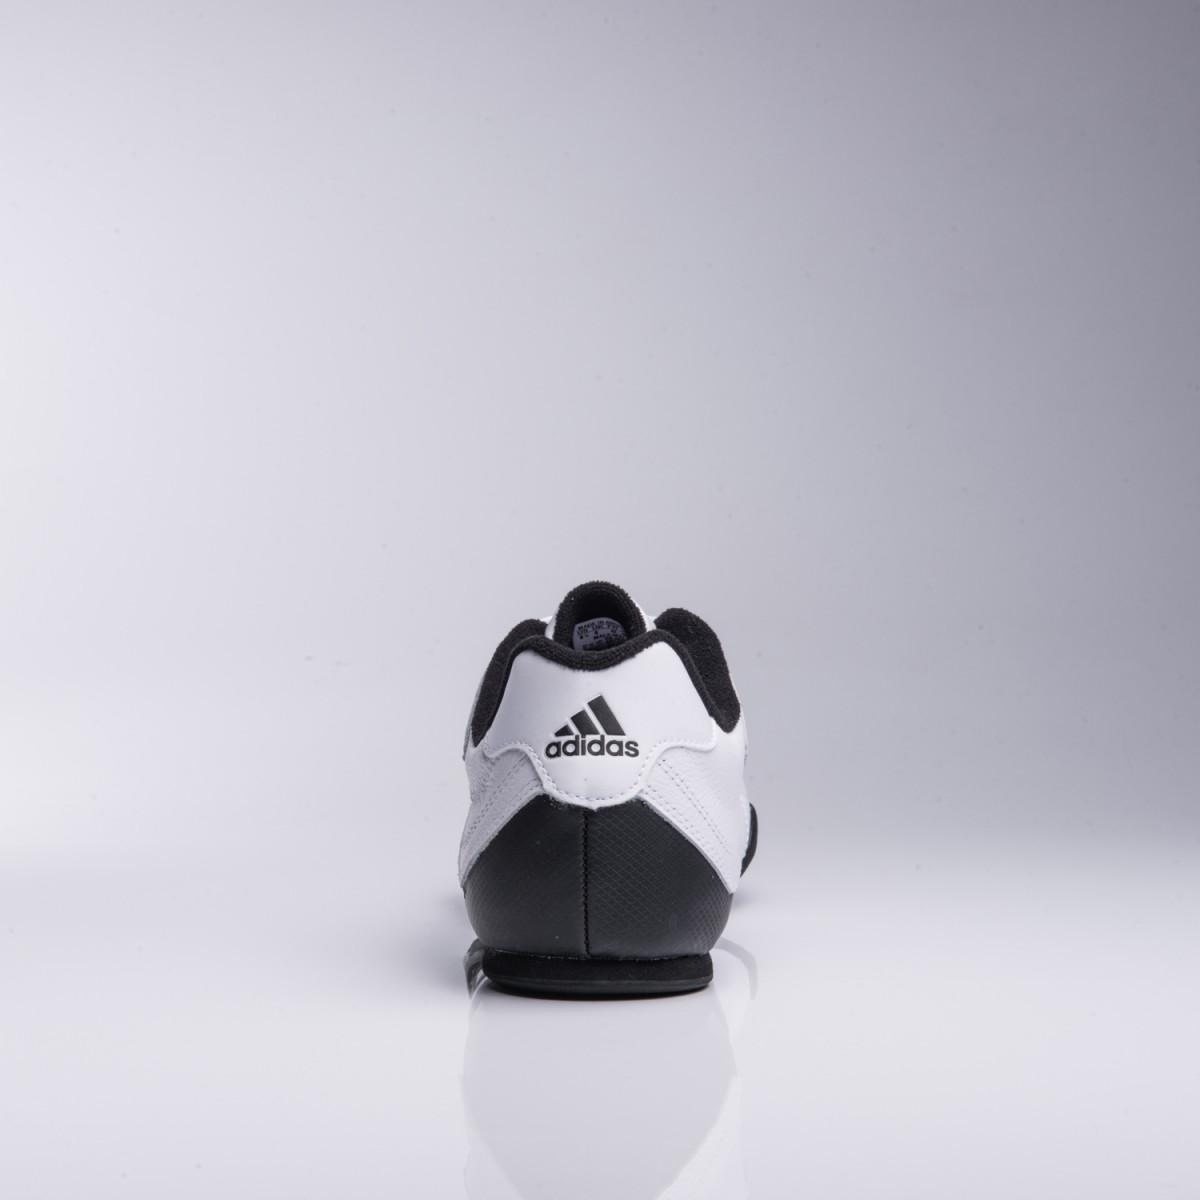 6d081e6bc88 Zapatillas Adidas Kundo II - Adidas % OFF